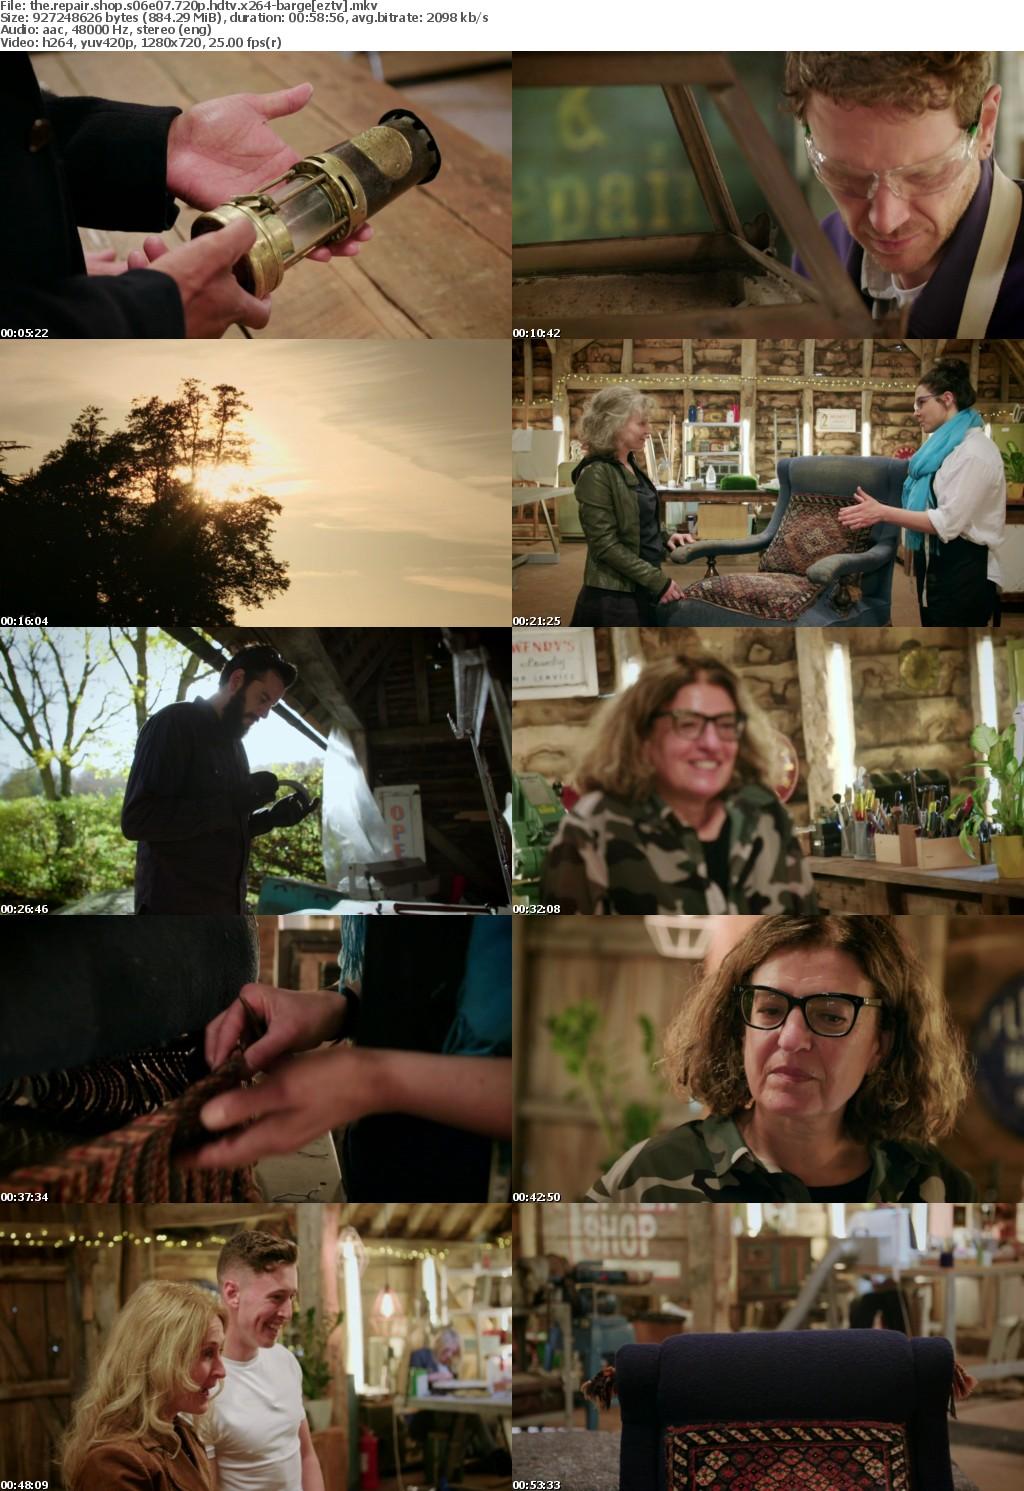 The Repair Shop S06E07 720p HDTV x264-BARGE